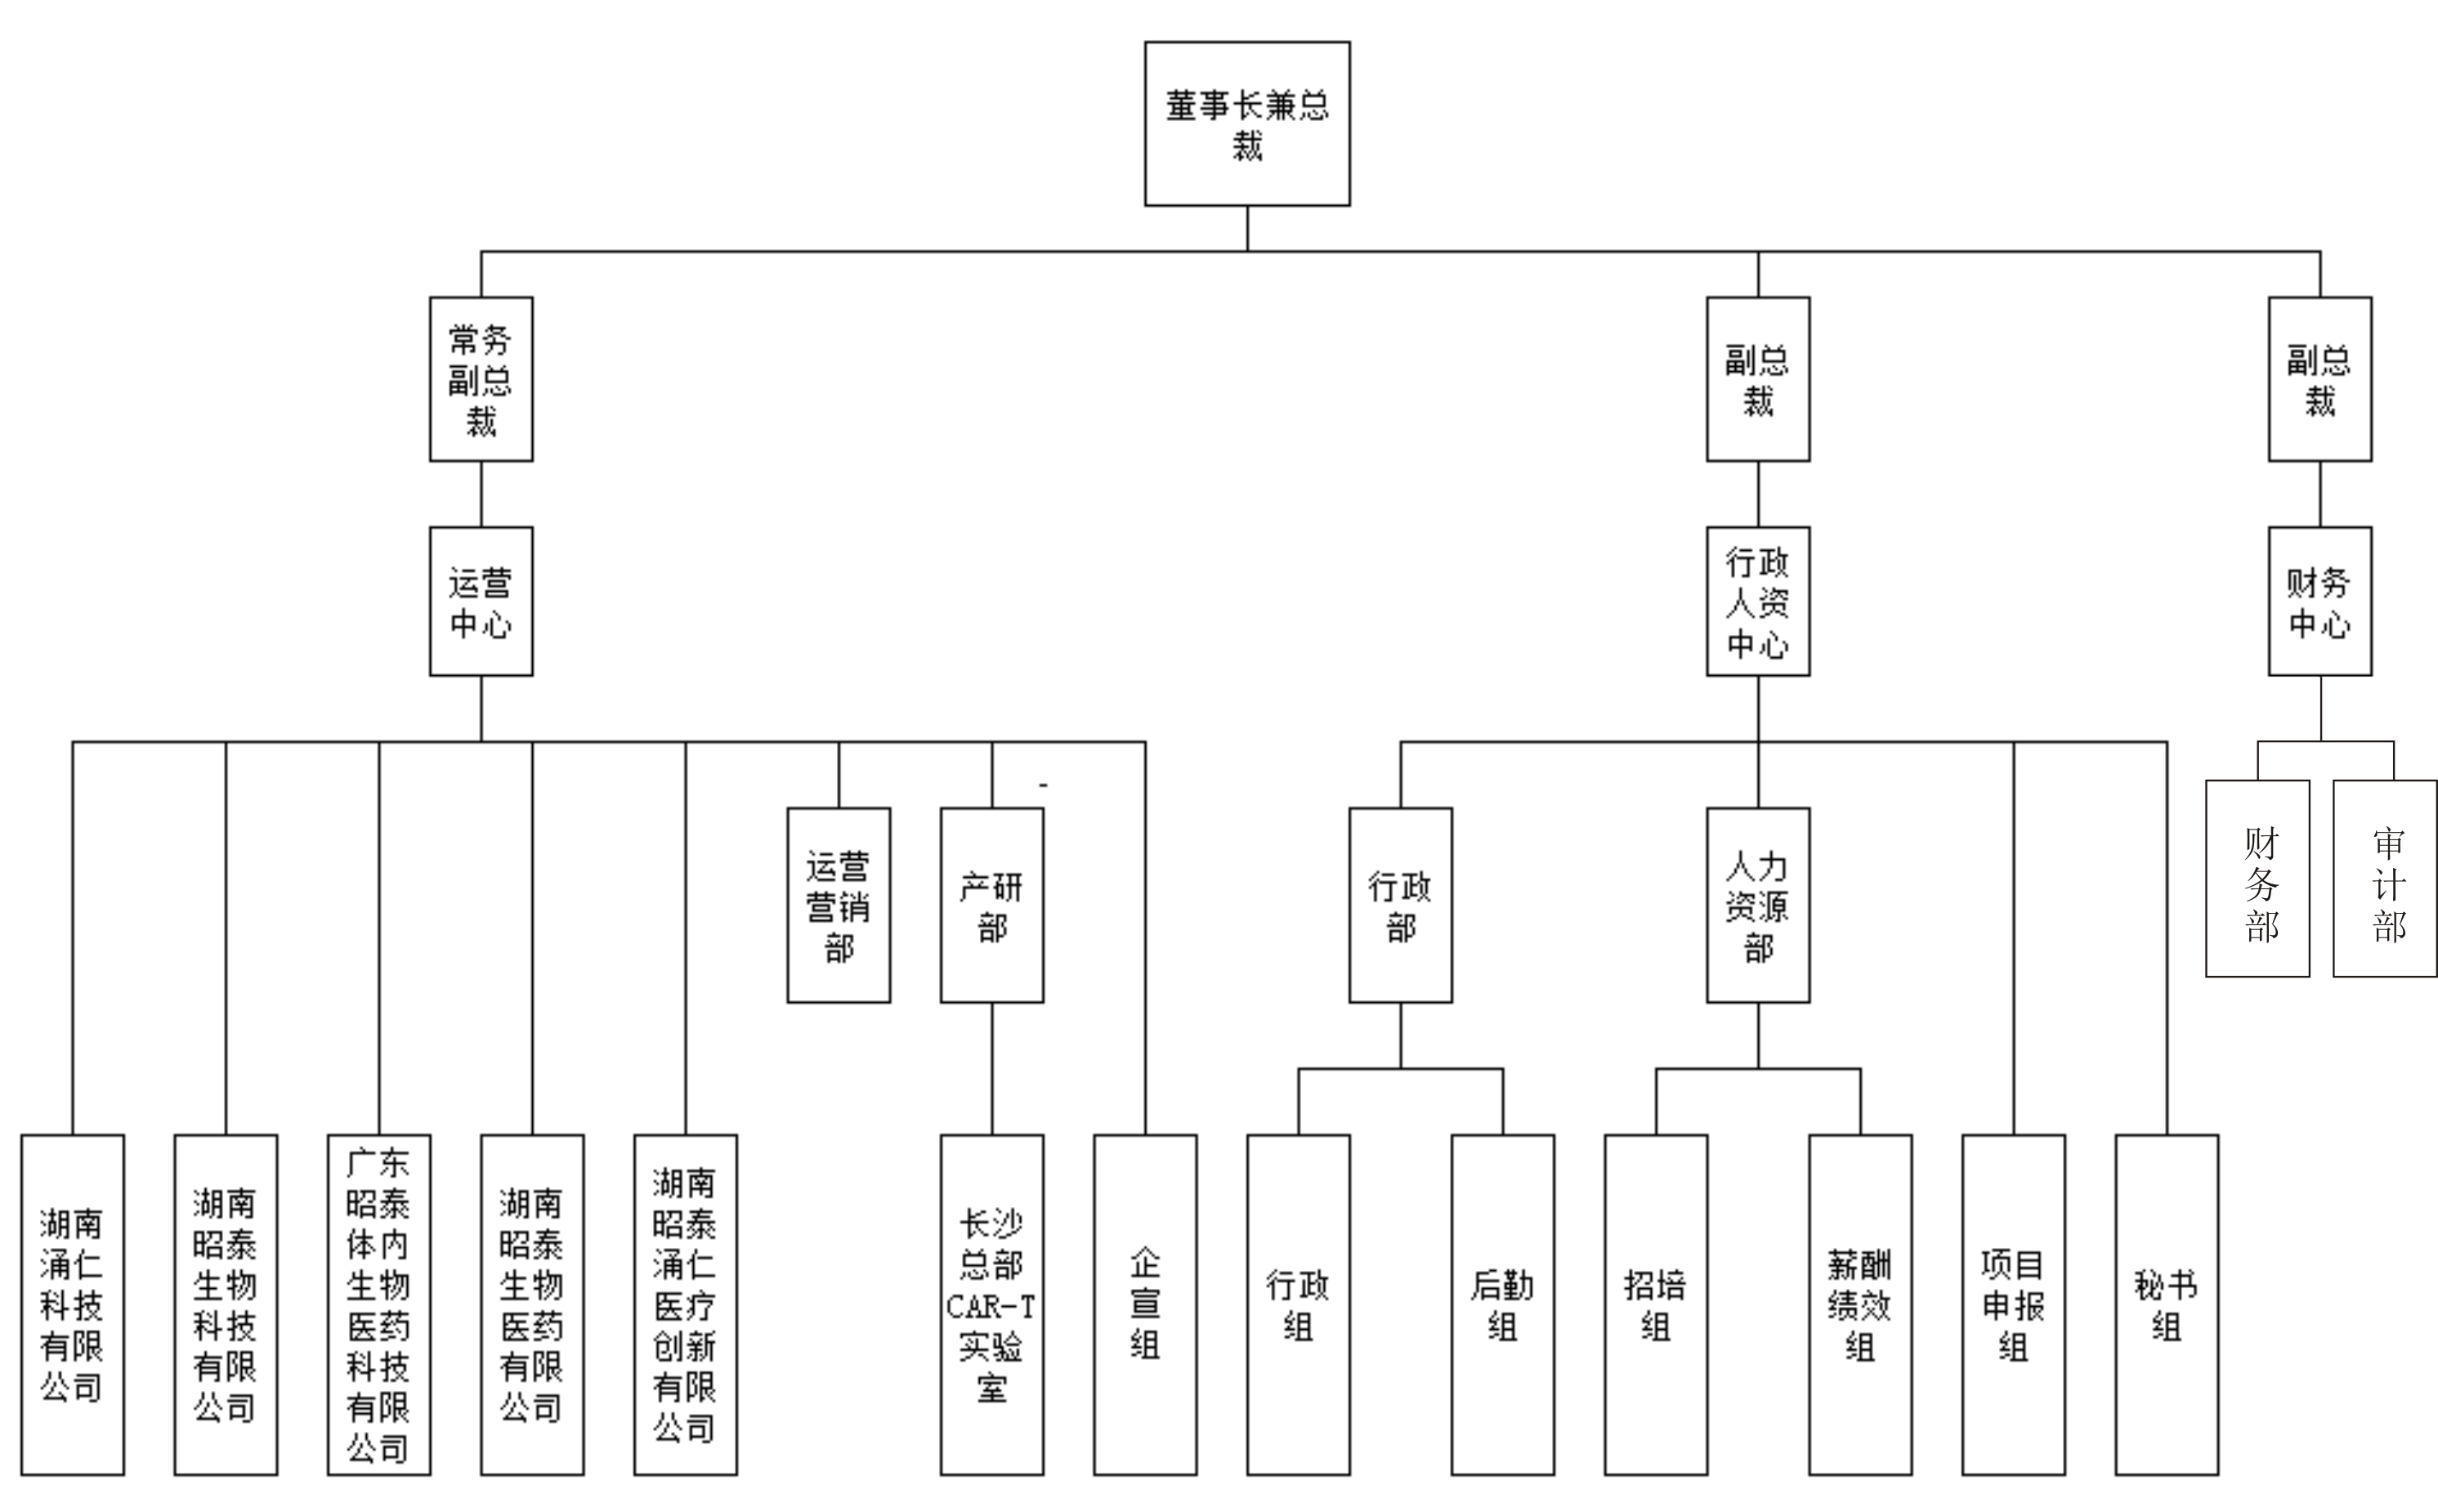 組織架構3.png